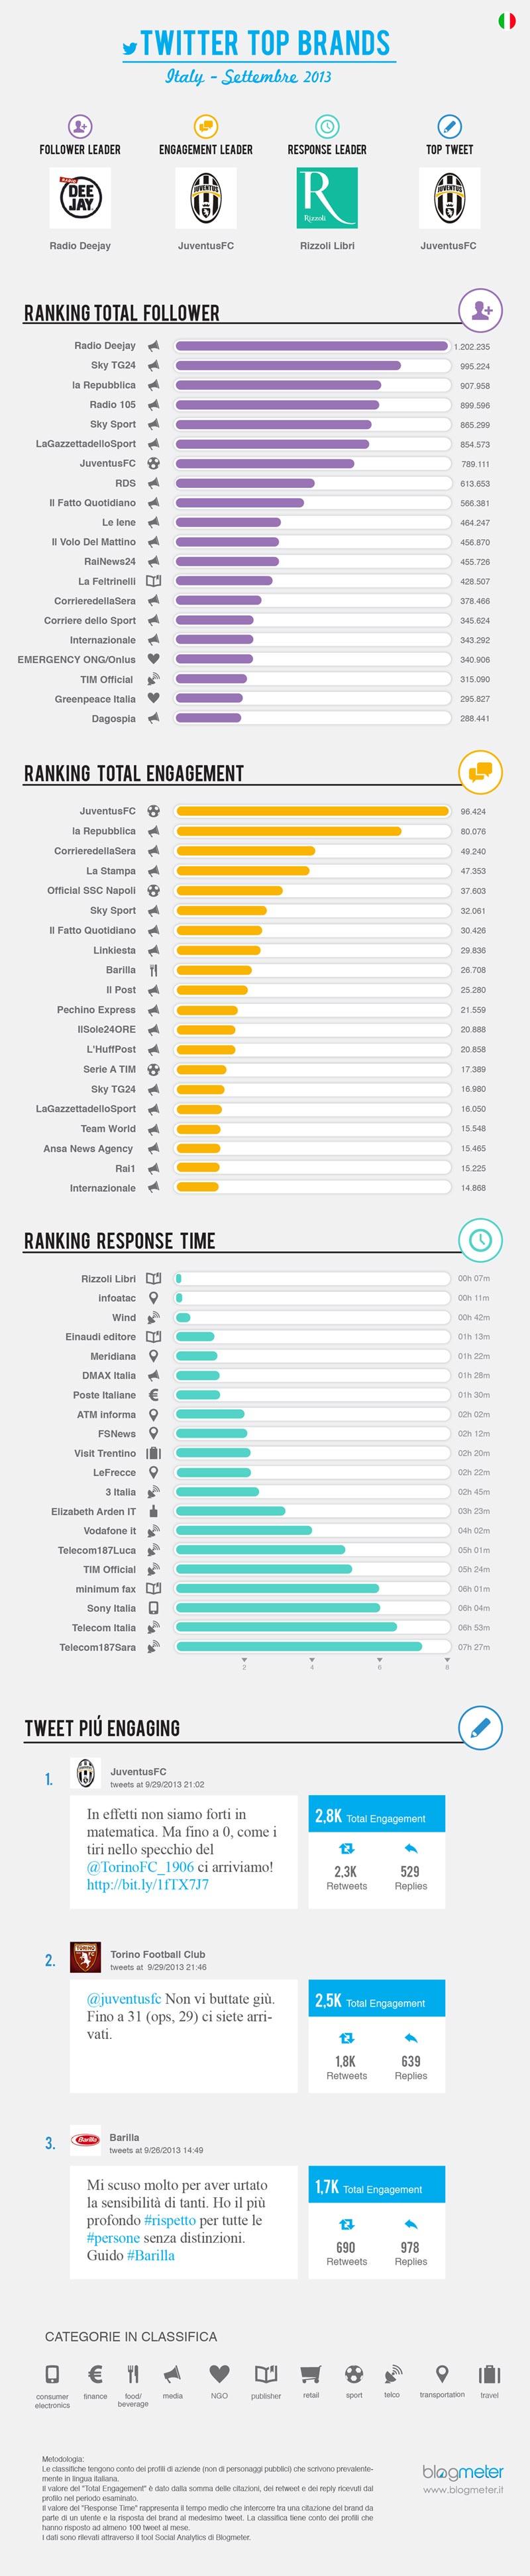 Blogmeter_Twitter Top Brands_Settembre2013_Infografica